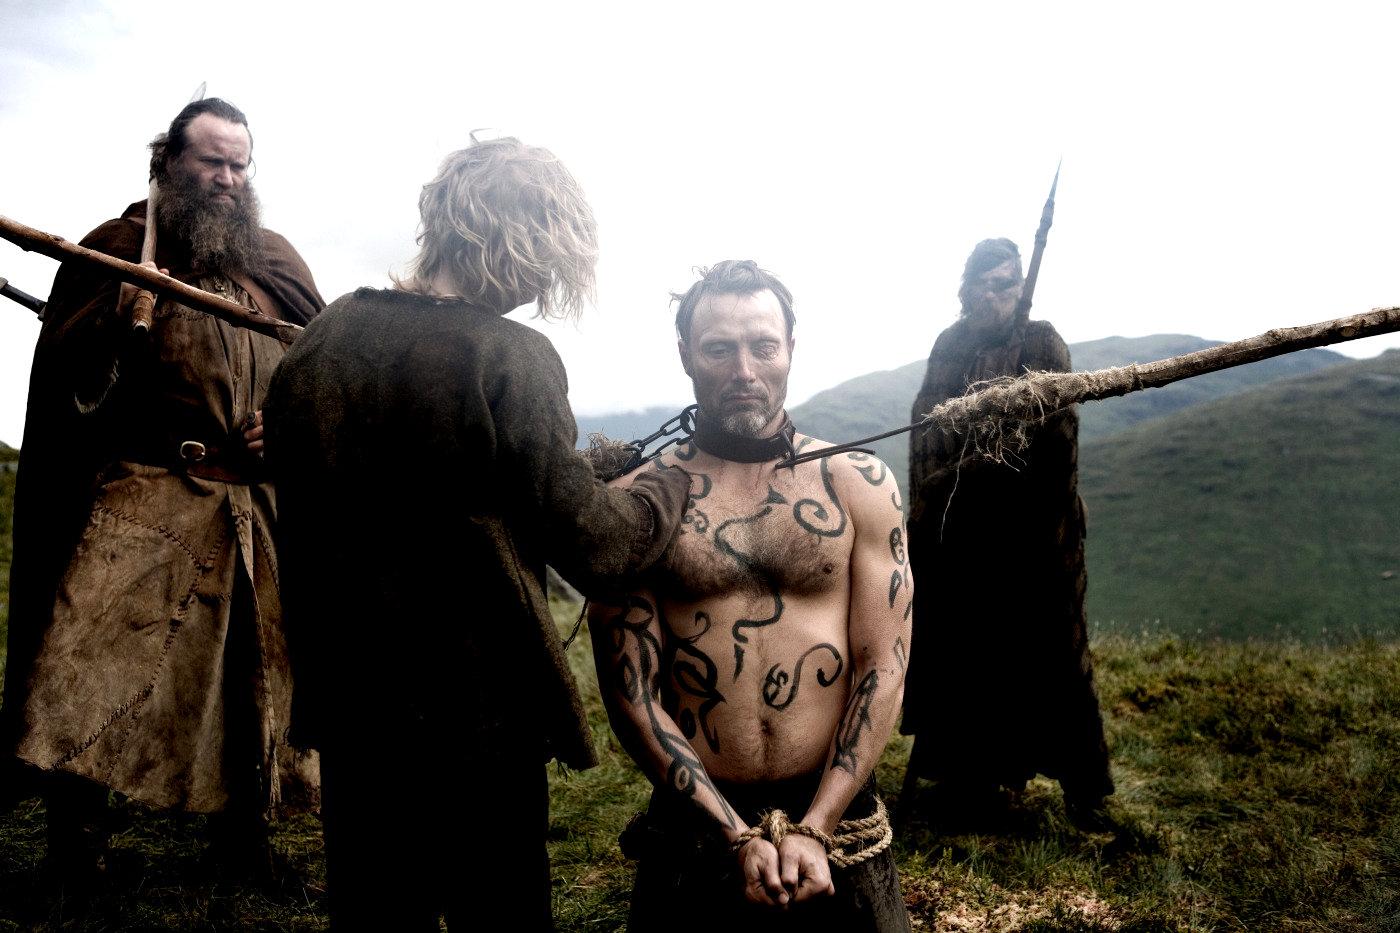 Highlander The Raven The viking slave trade...